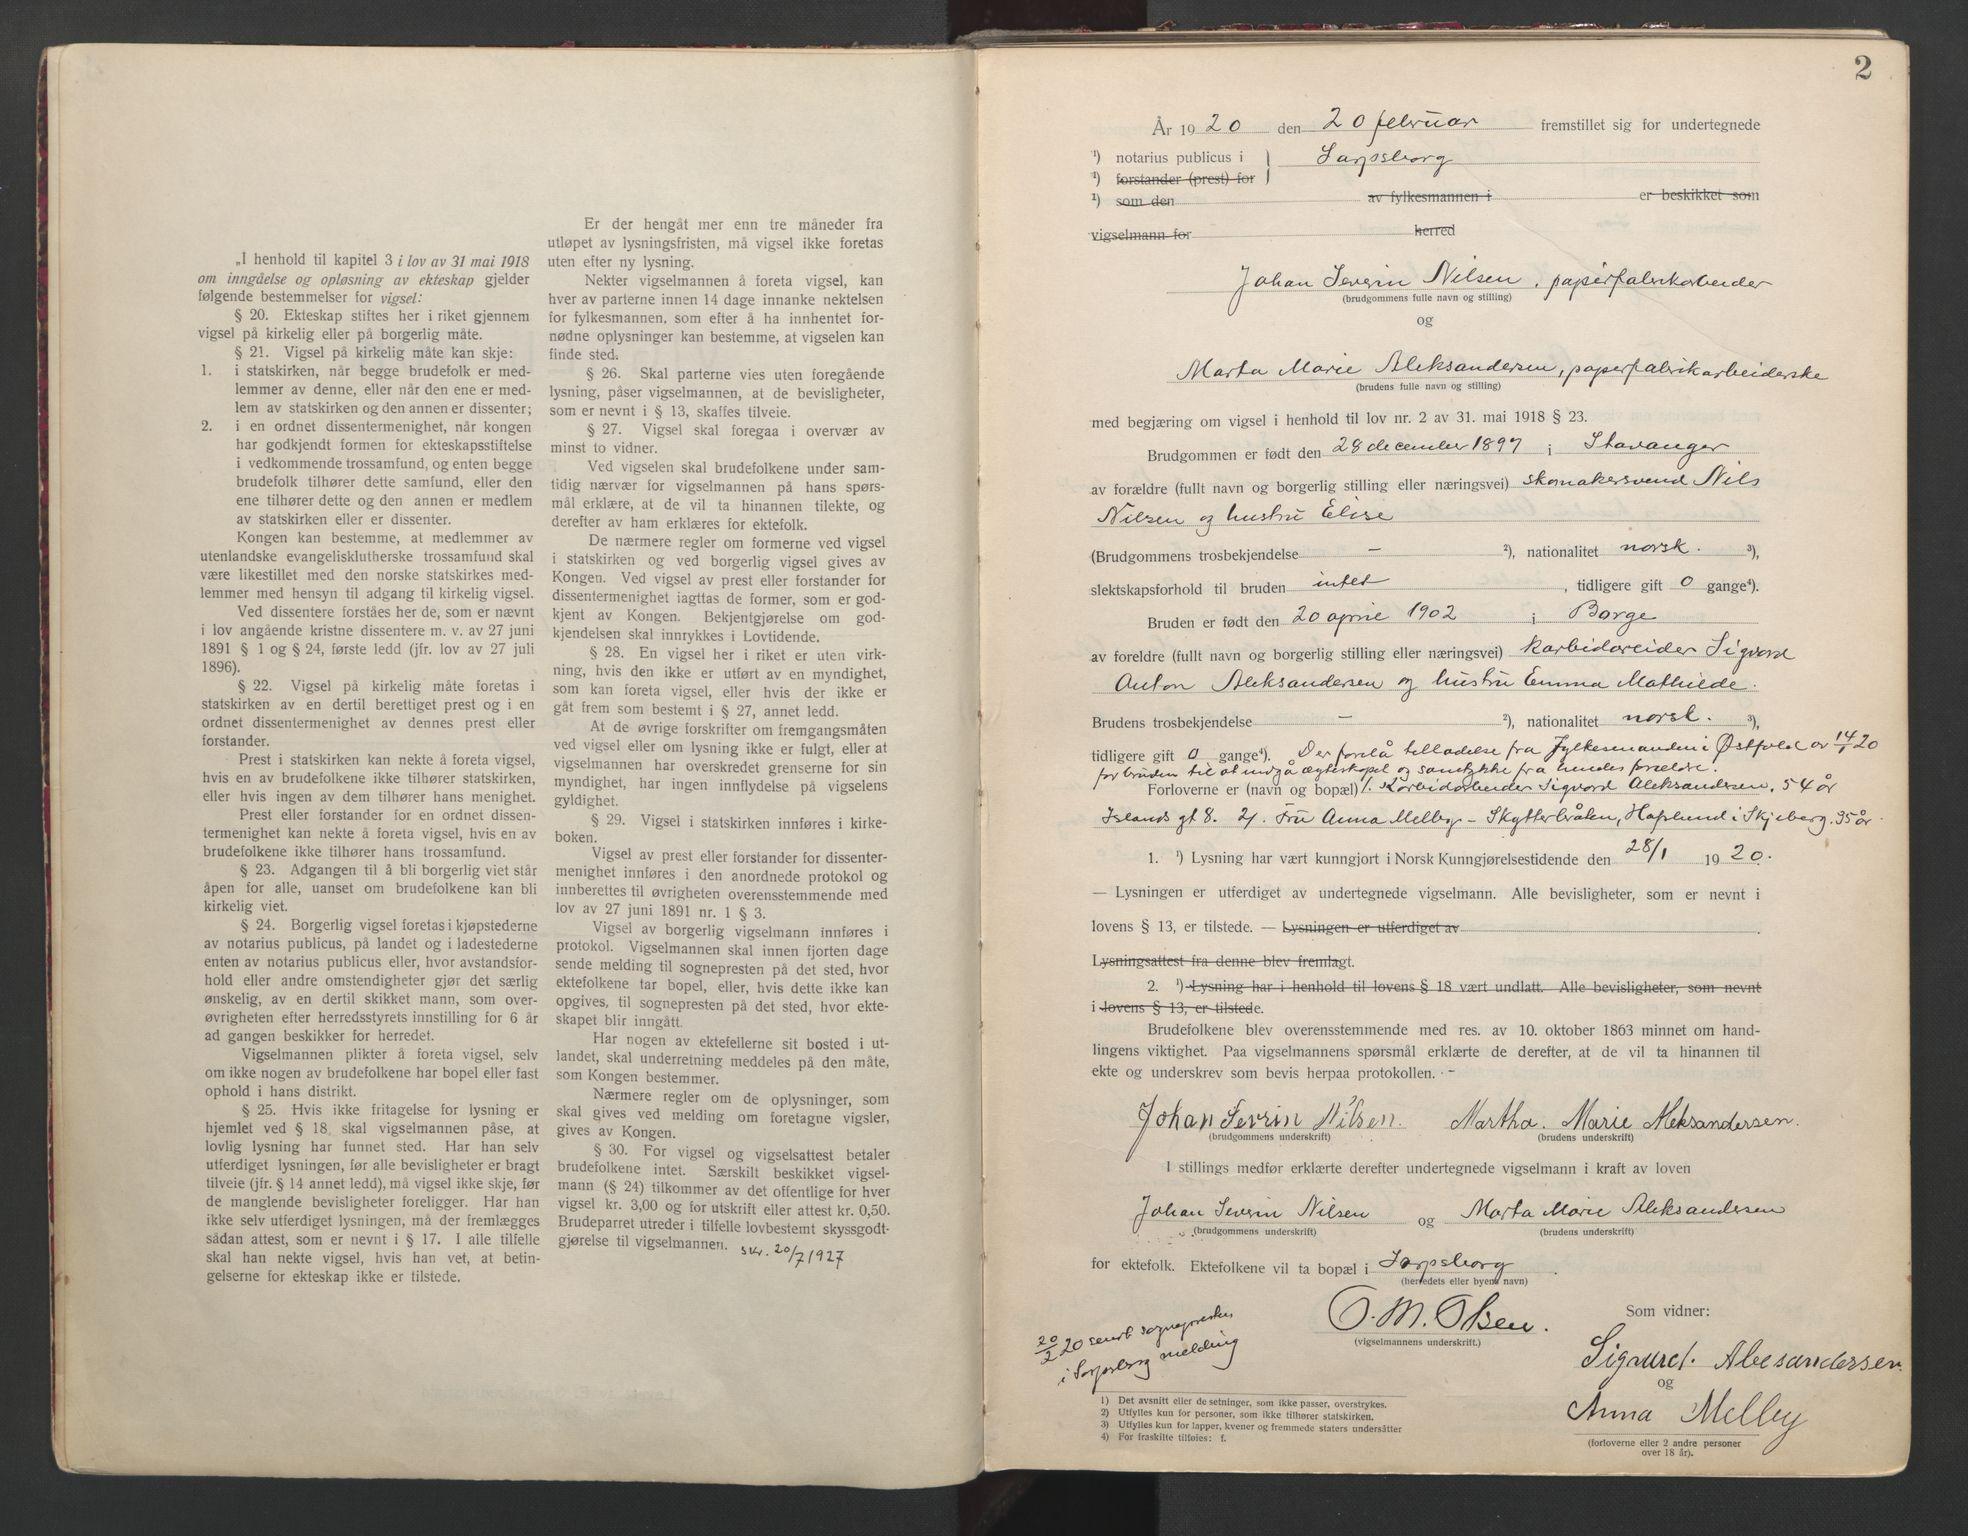 SAO, Sarpsborg byfogd, L/Lb/Lba/L0001: Vigselbok, 1920-1941, s. 2